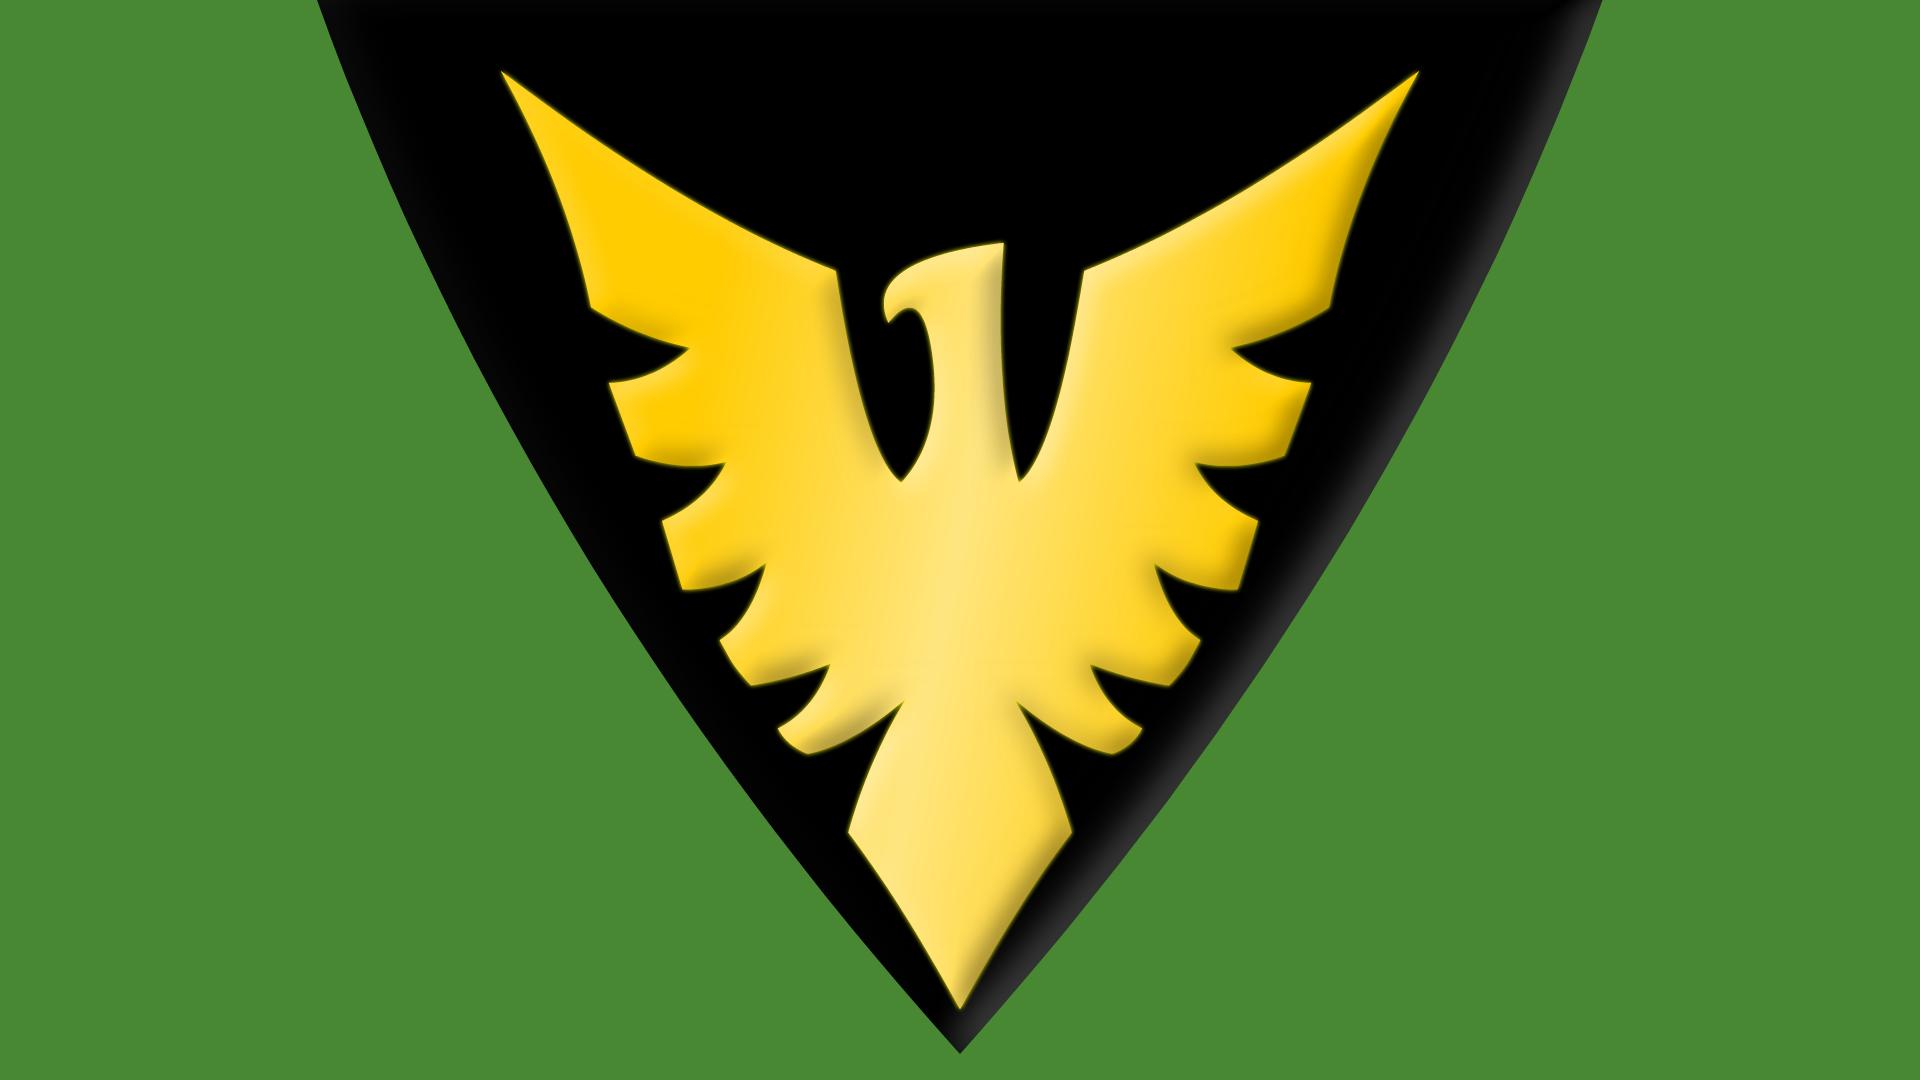 Phoenix Symbol By Yurtigo On Deviantart